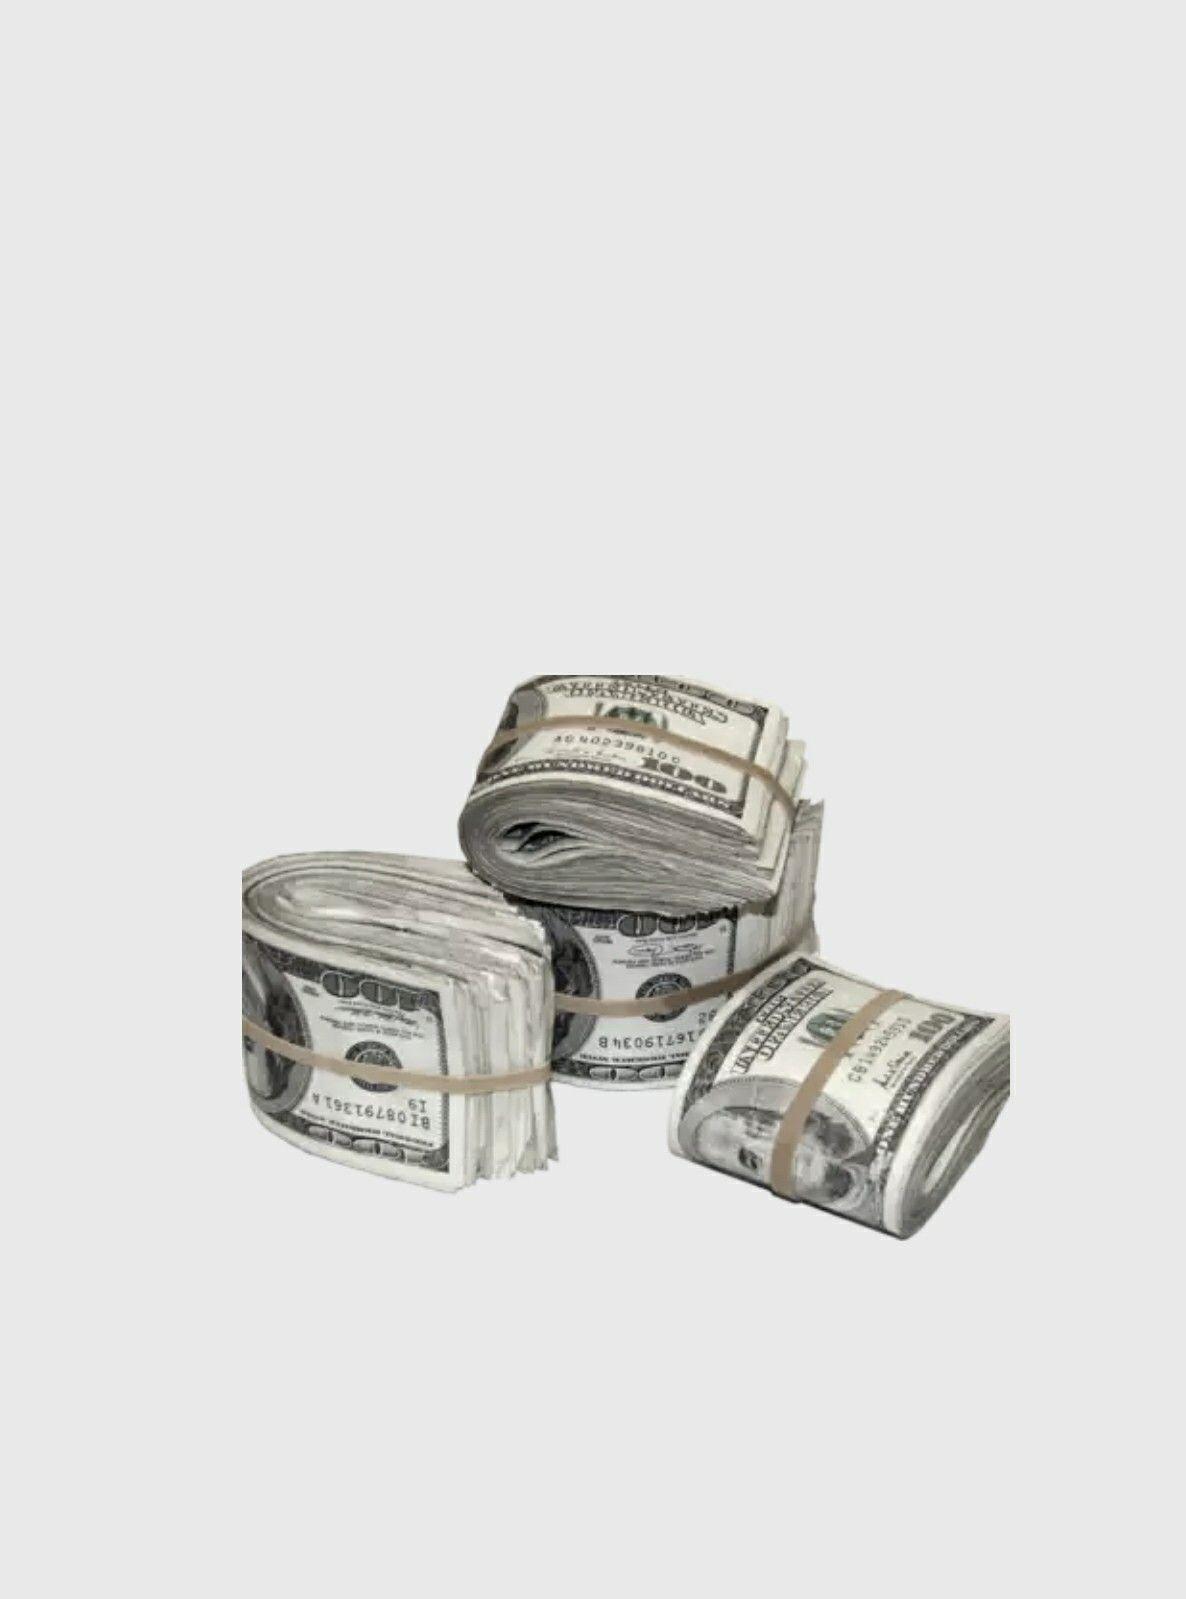 28 degrees bpay cash advance picture 10